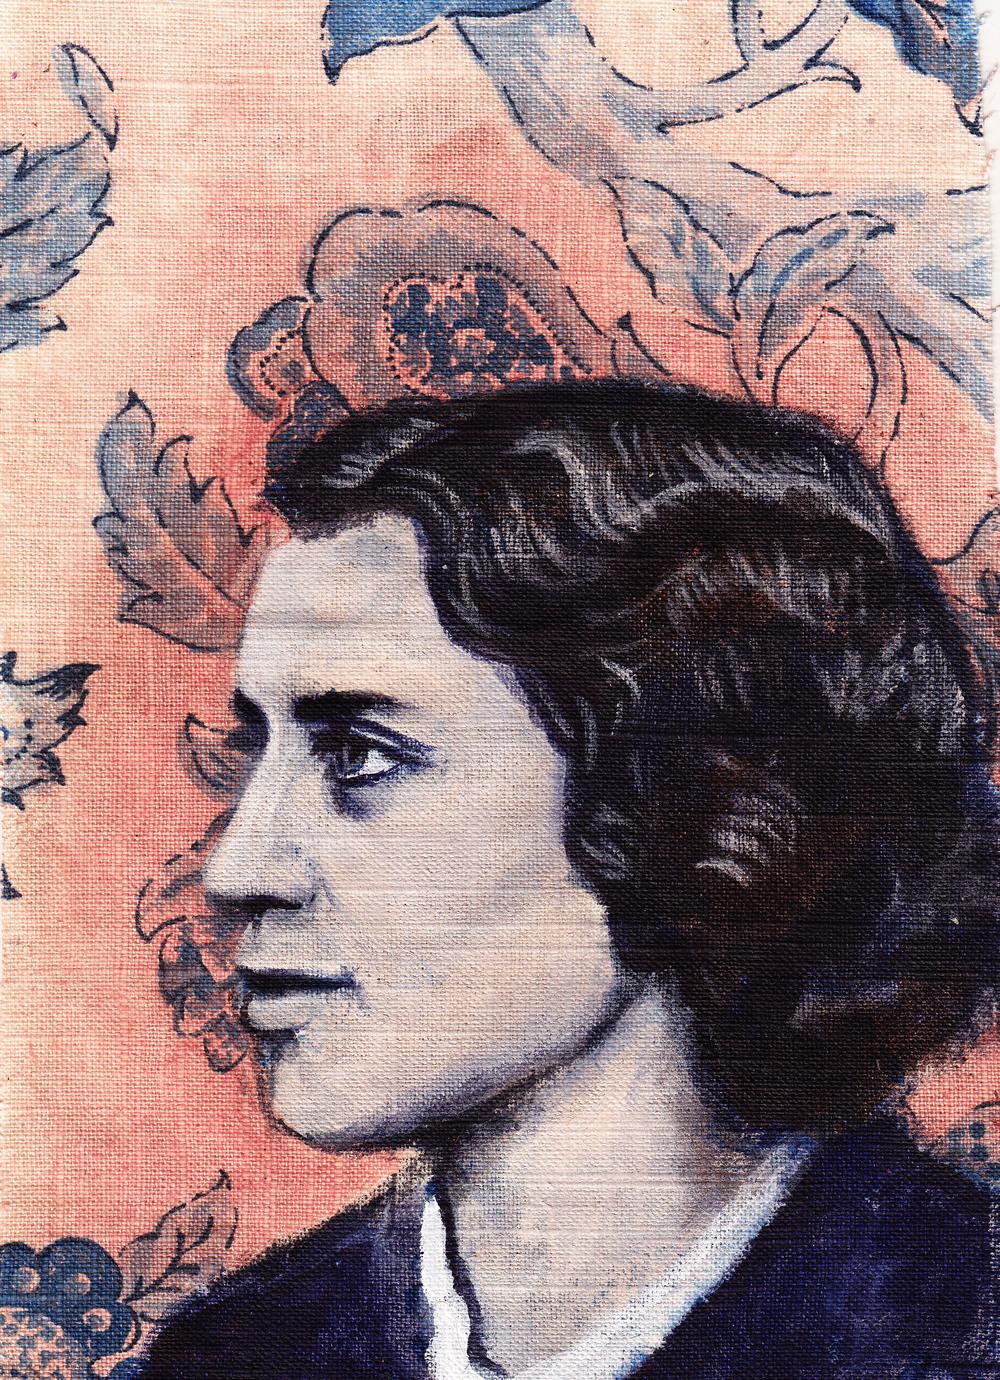 Anna Elizabeth Dickinson